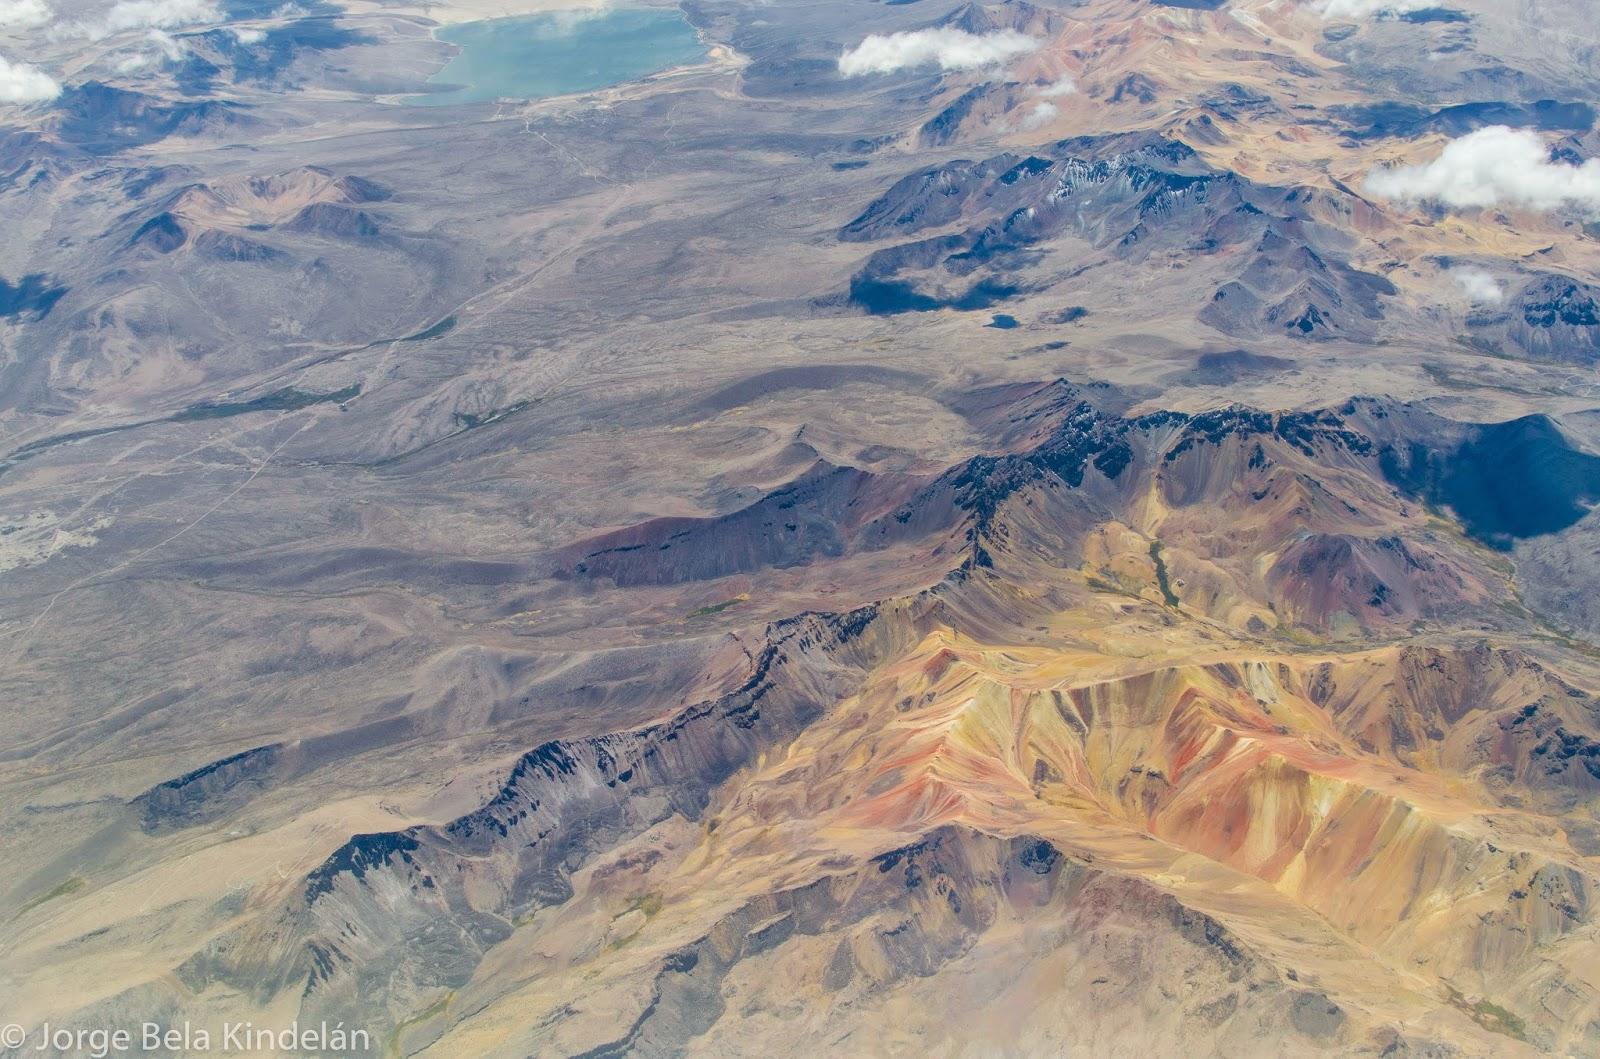 Zona desértica al norte de Chile. Foto: Jorge Bela